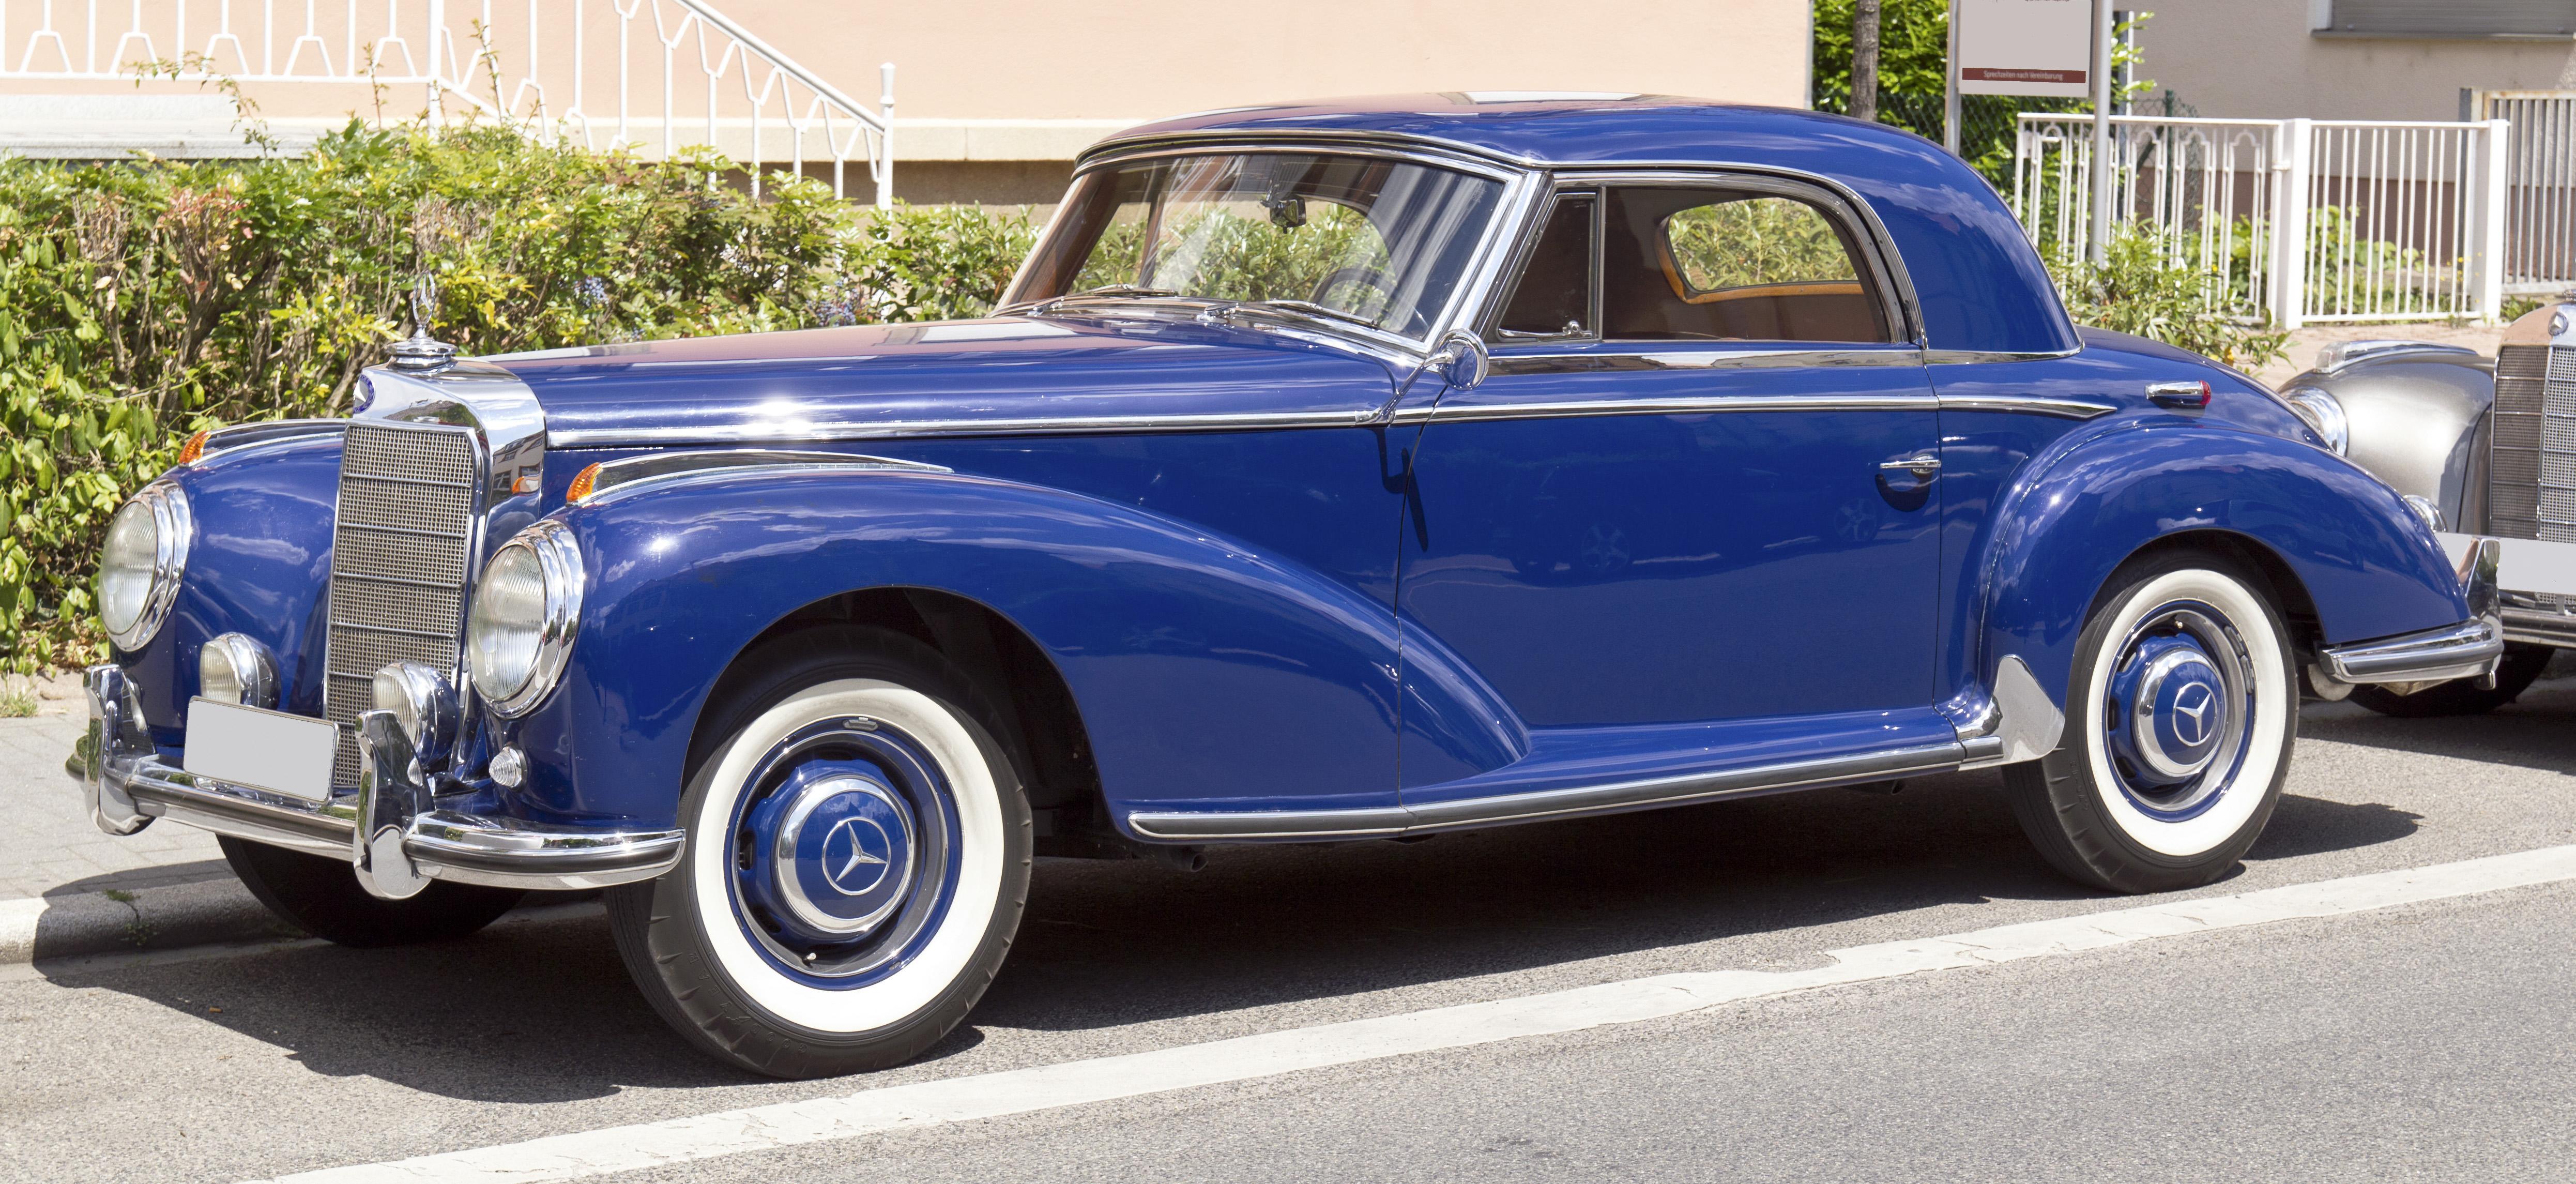 Mercedes classe s coup 2014 en bref mediacar for Vintage mercedes benz parts